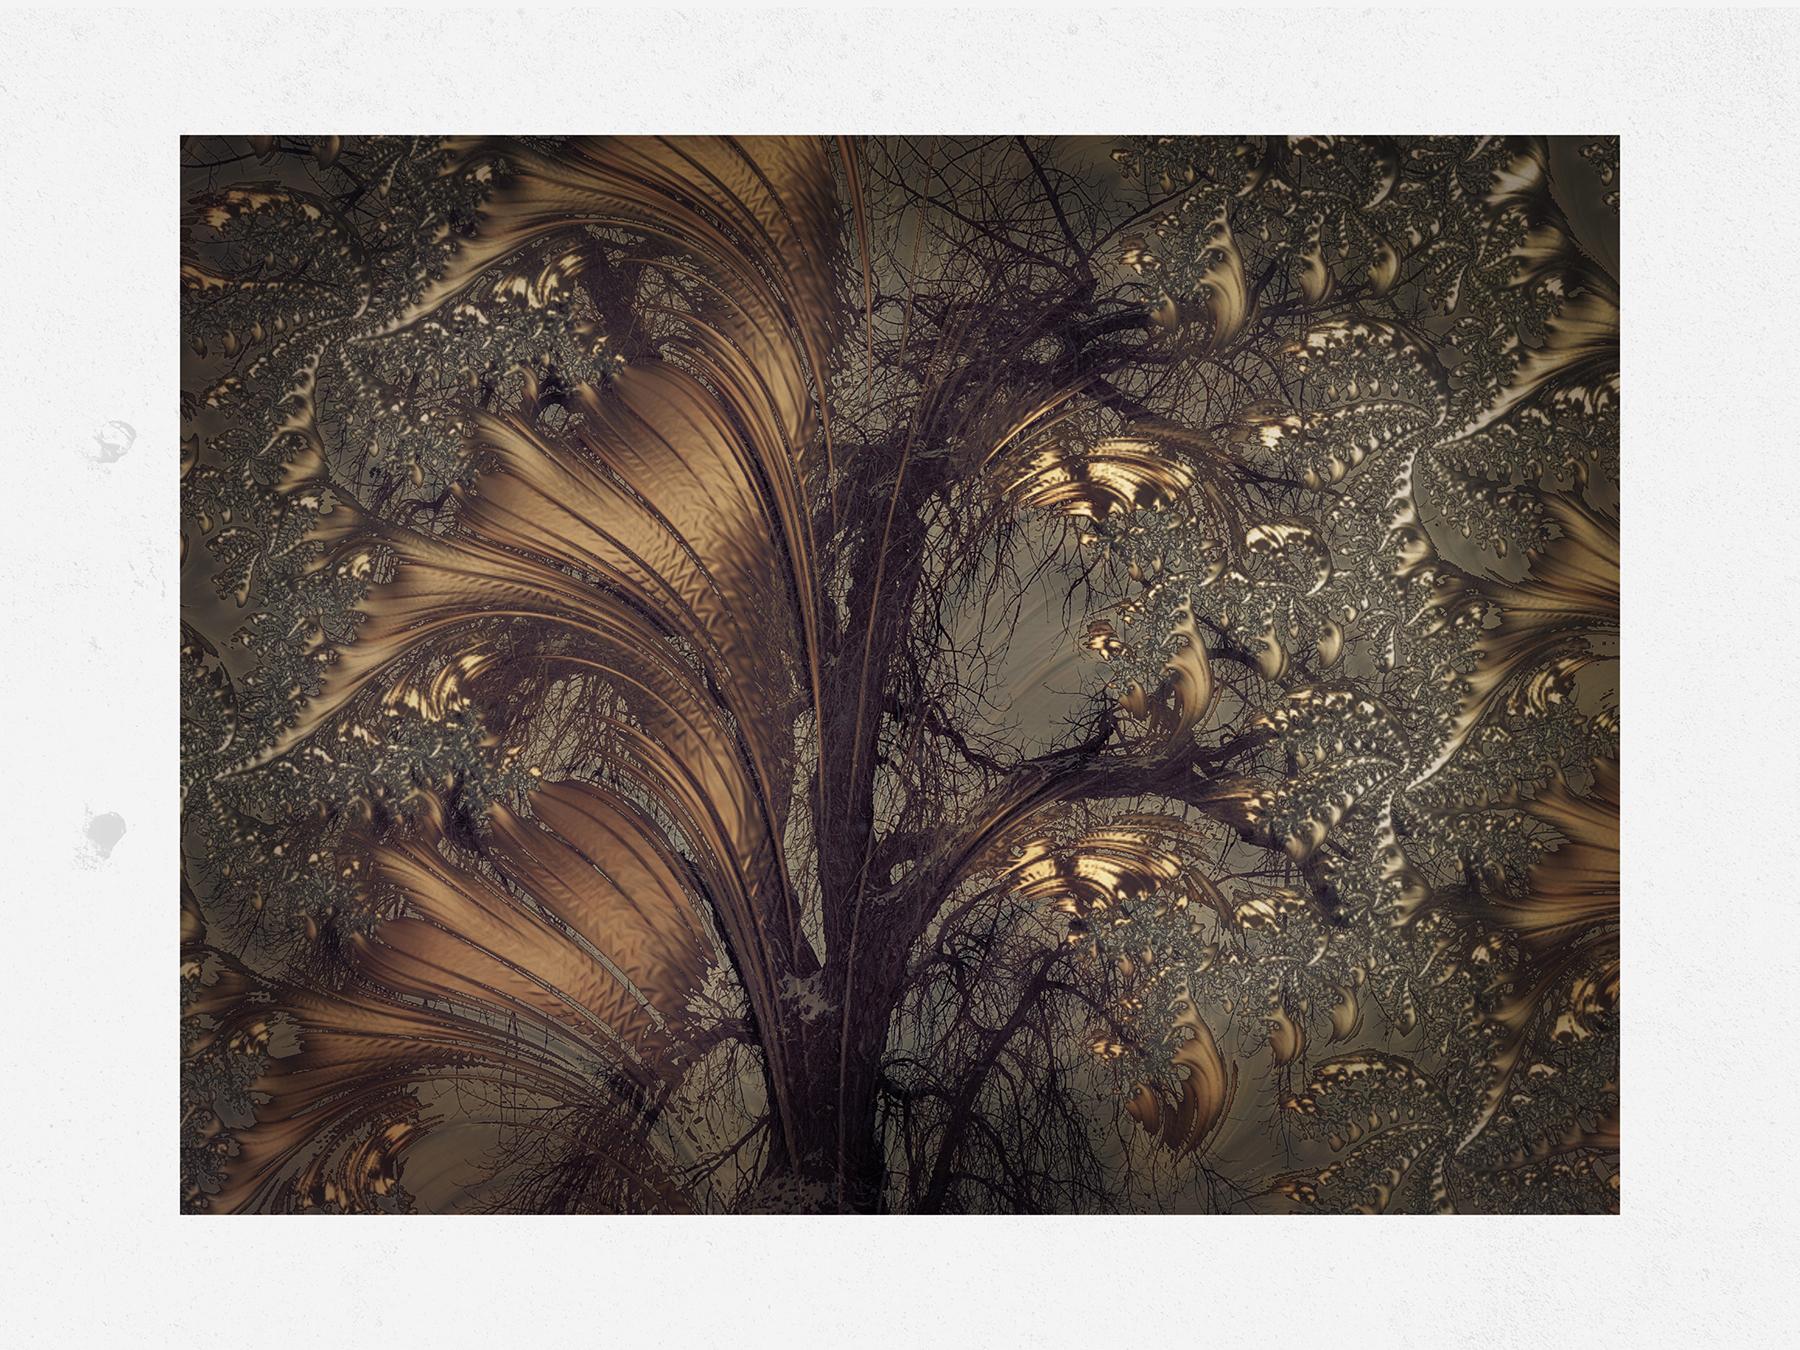 Kate_ZariRoberts_Nature Fractals_Tree Fractal lll_3.jpg